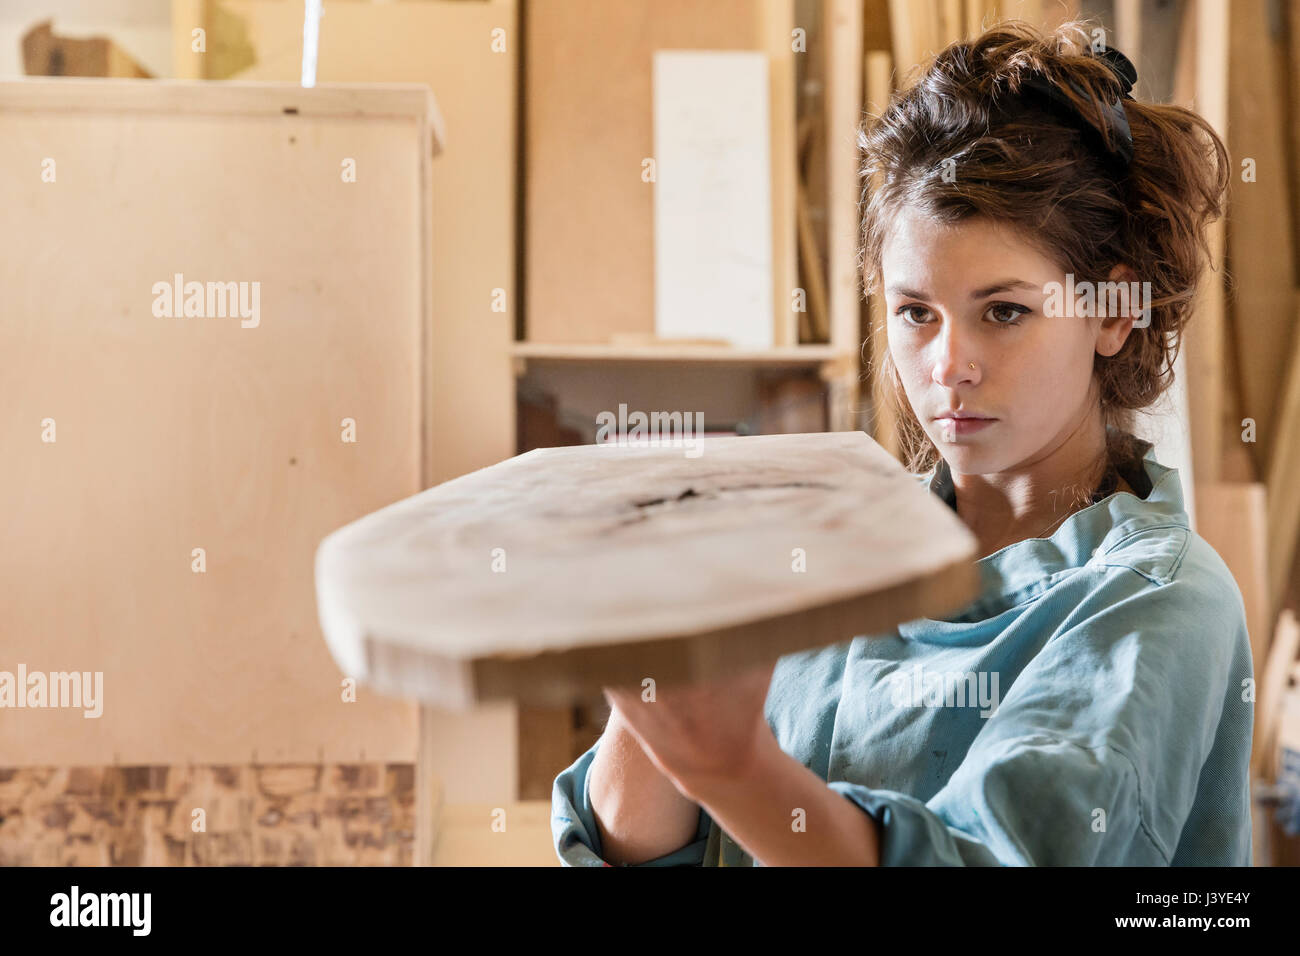 Junge Frau Holz Probe in einer Werkstatt prüfen Stockbild